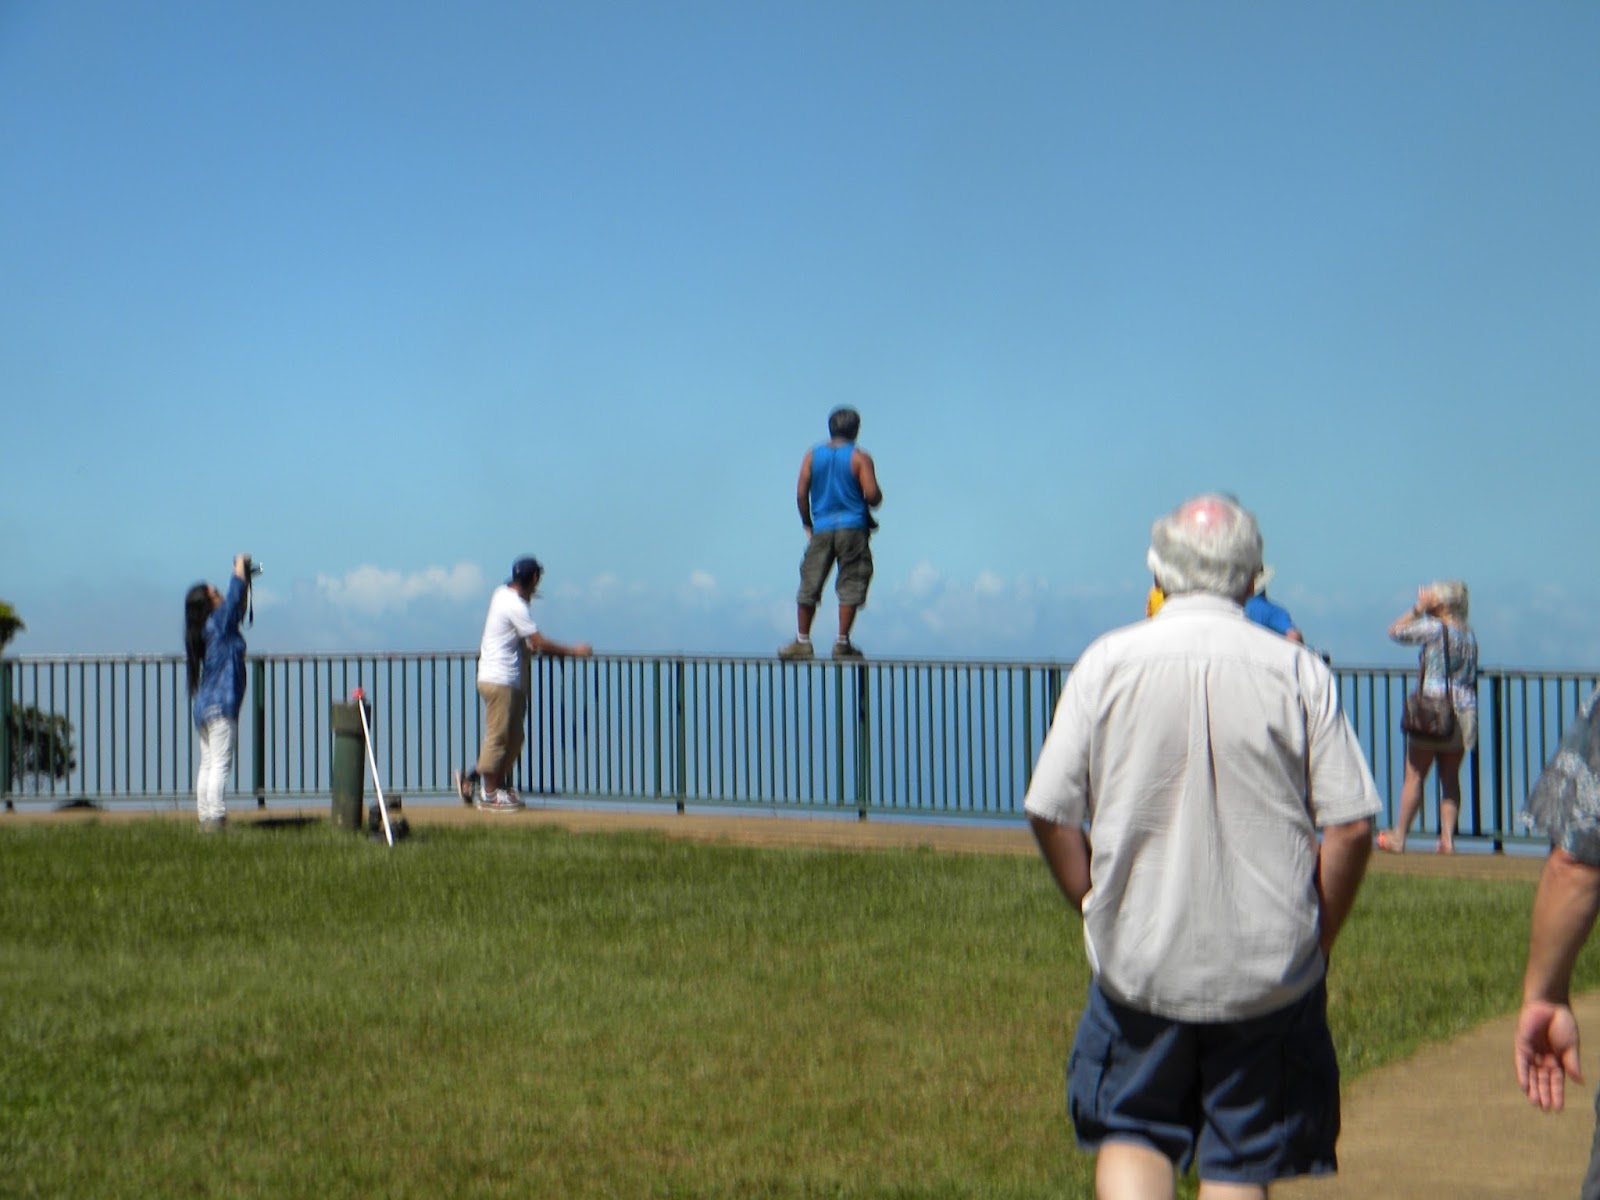 All Hawaii News: Risky behavior puts tourists at risk